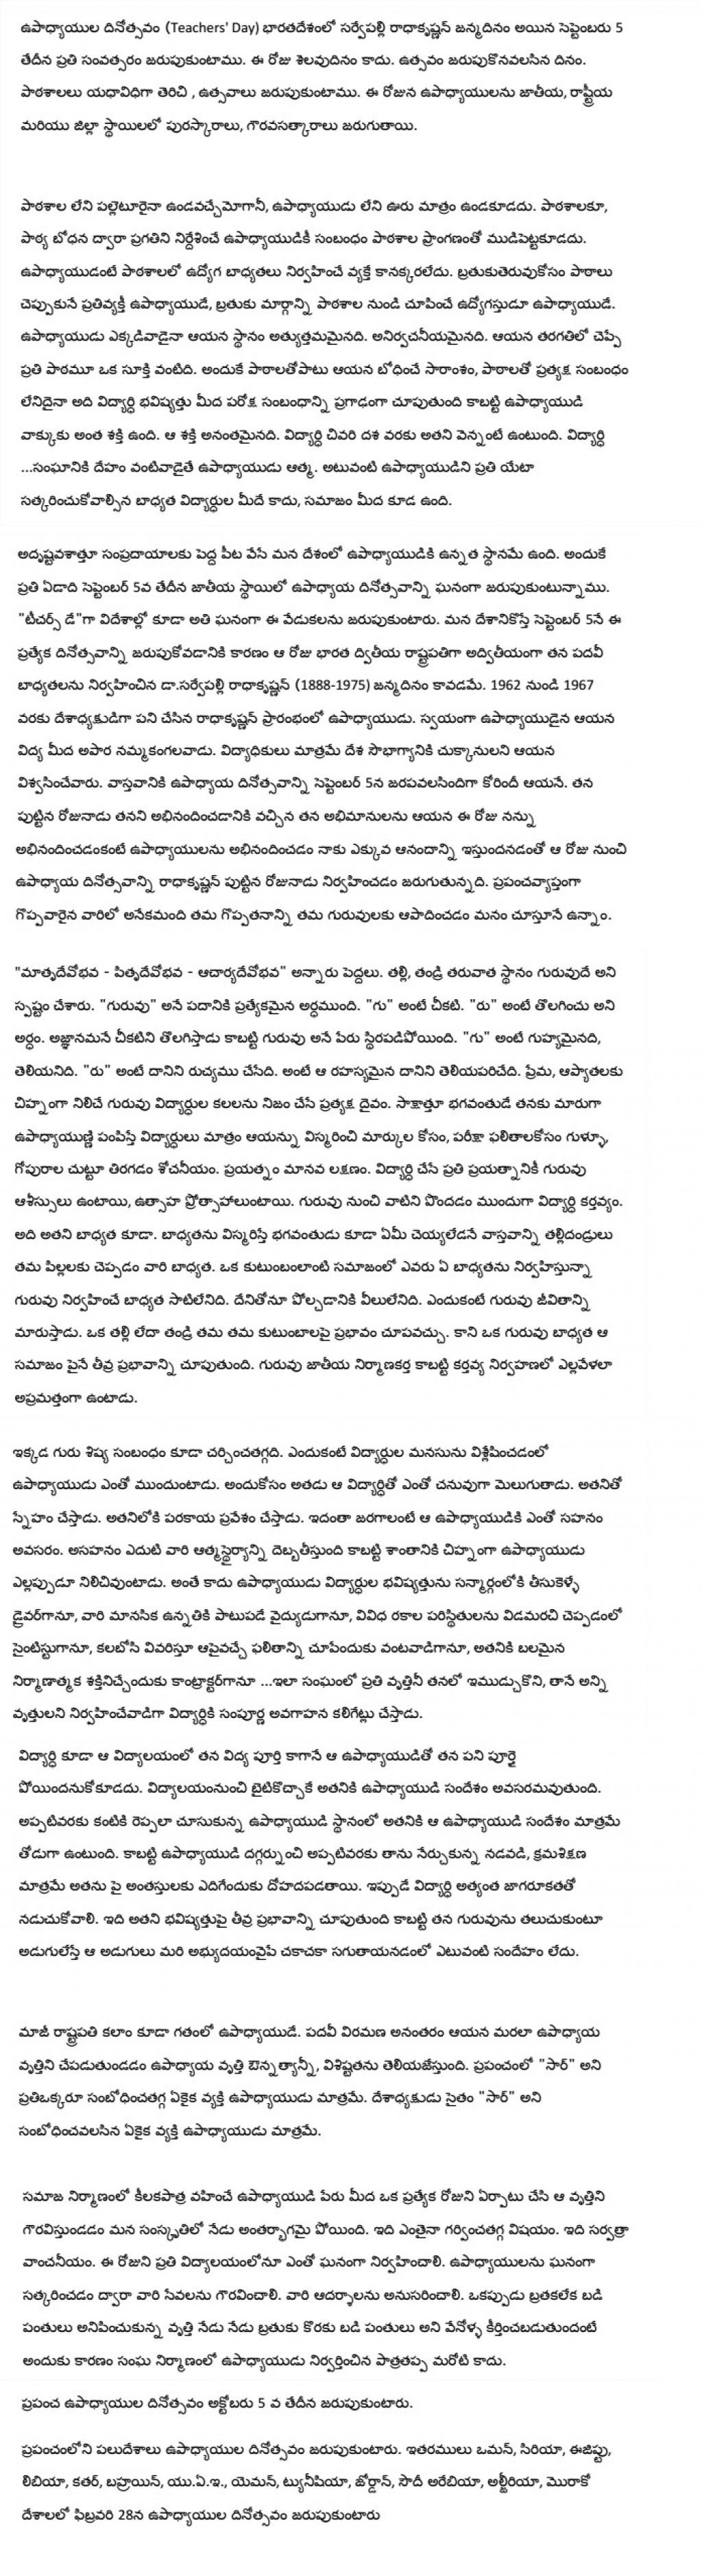 004 Environmental Protection Essay Stupendous In Tamil English Pdf Hindi Large